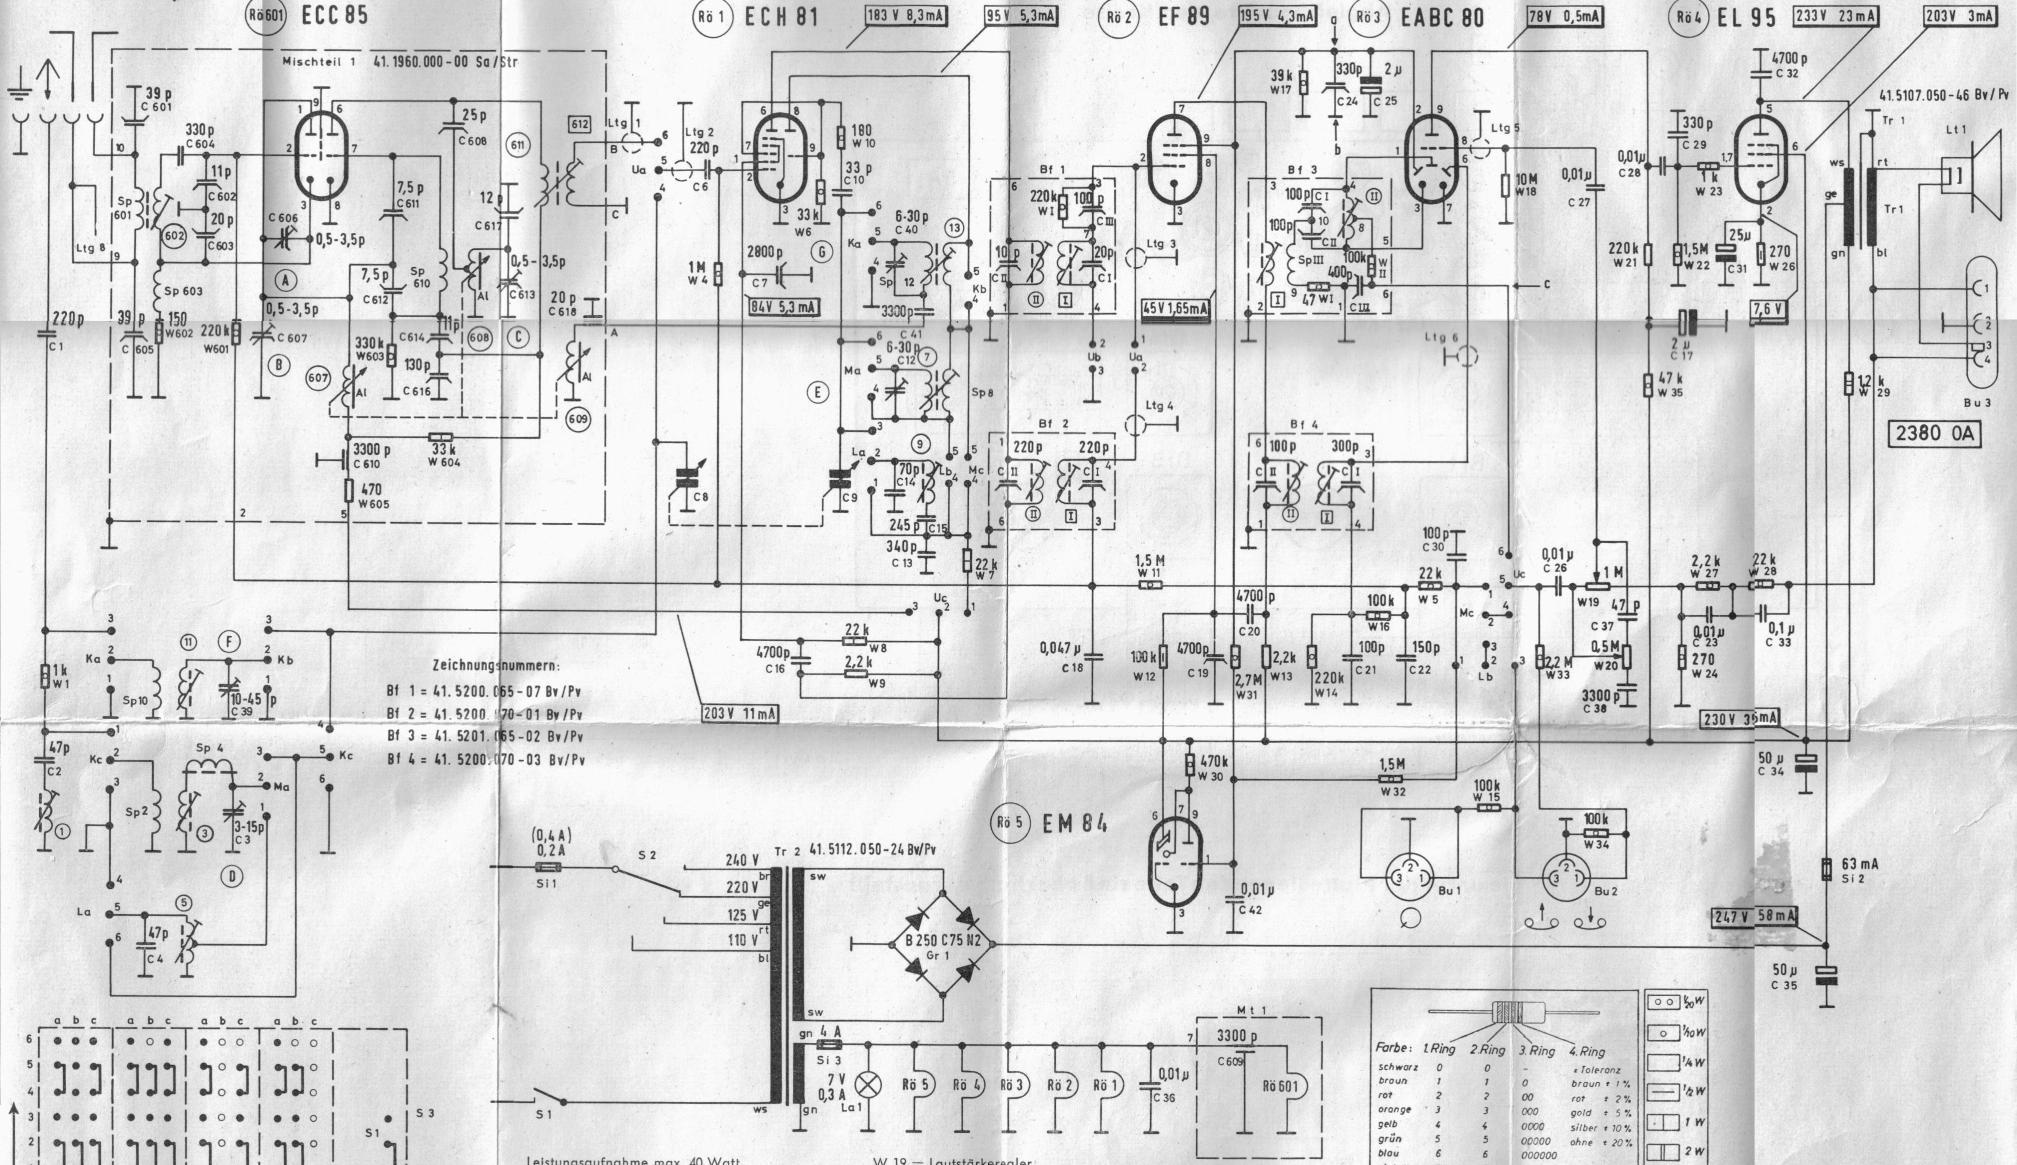 Wunderbar Lichtschalter Steckdose Combo Schaltplan Galerie ...